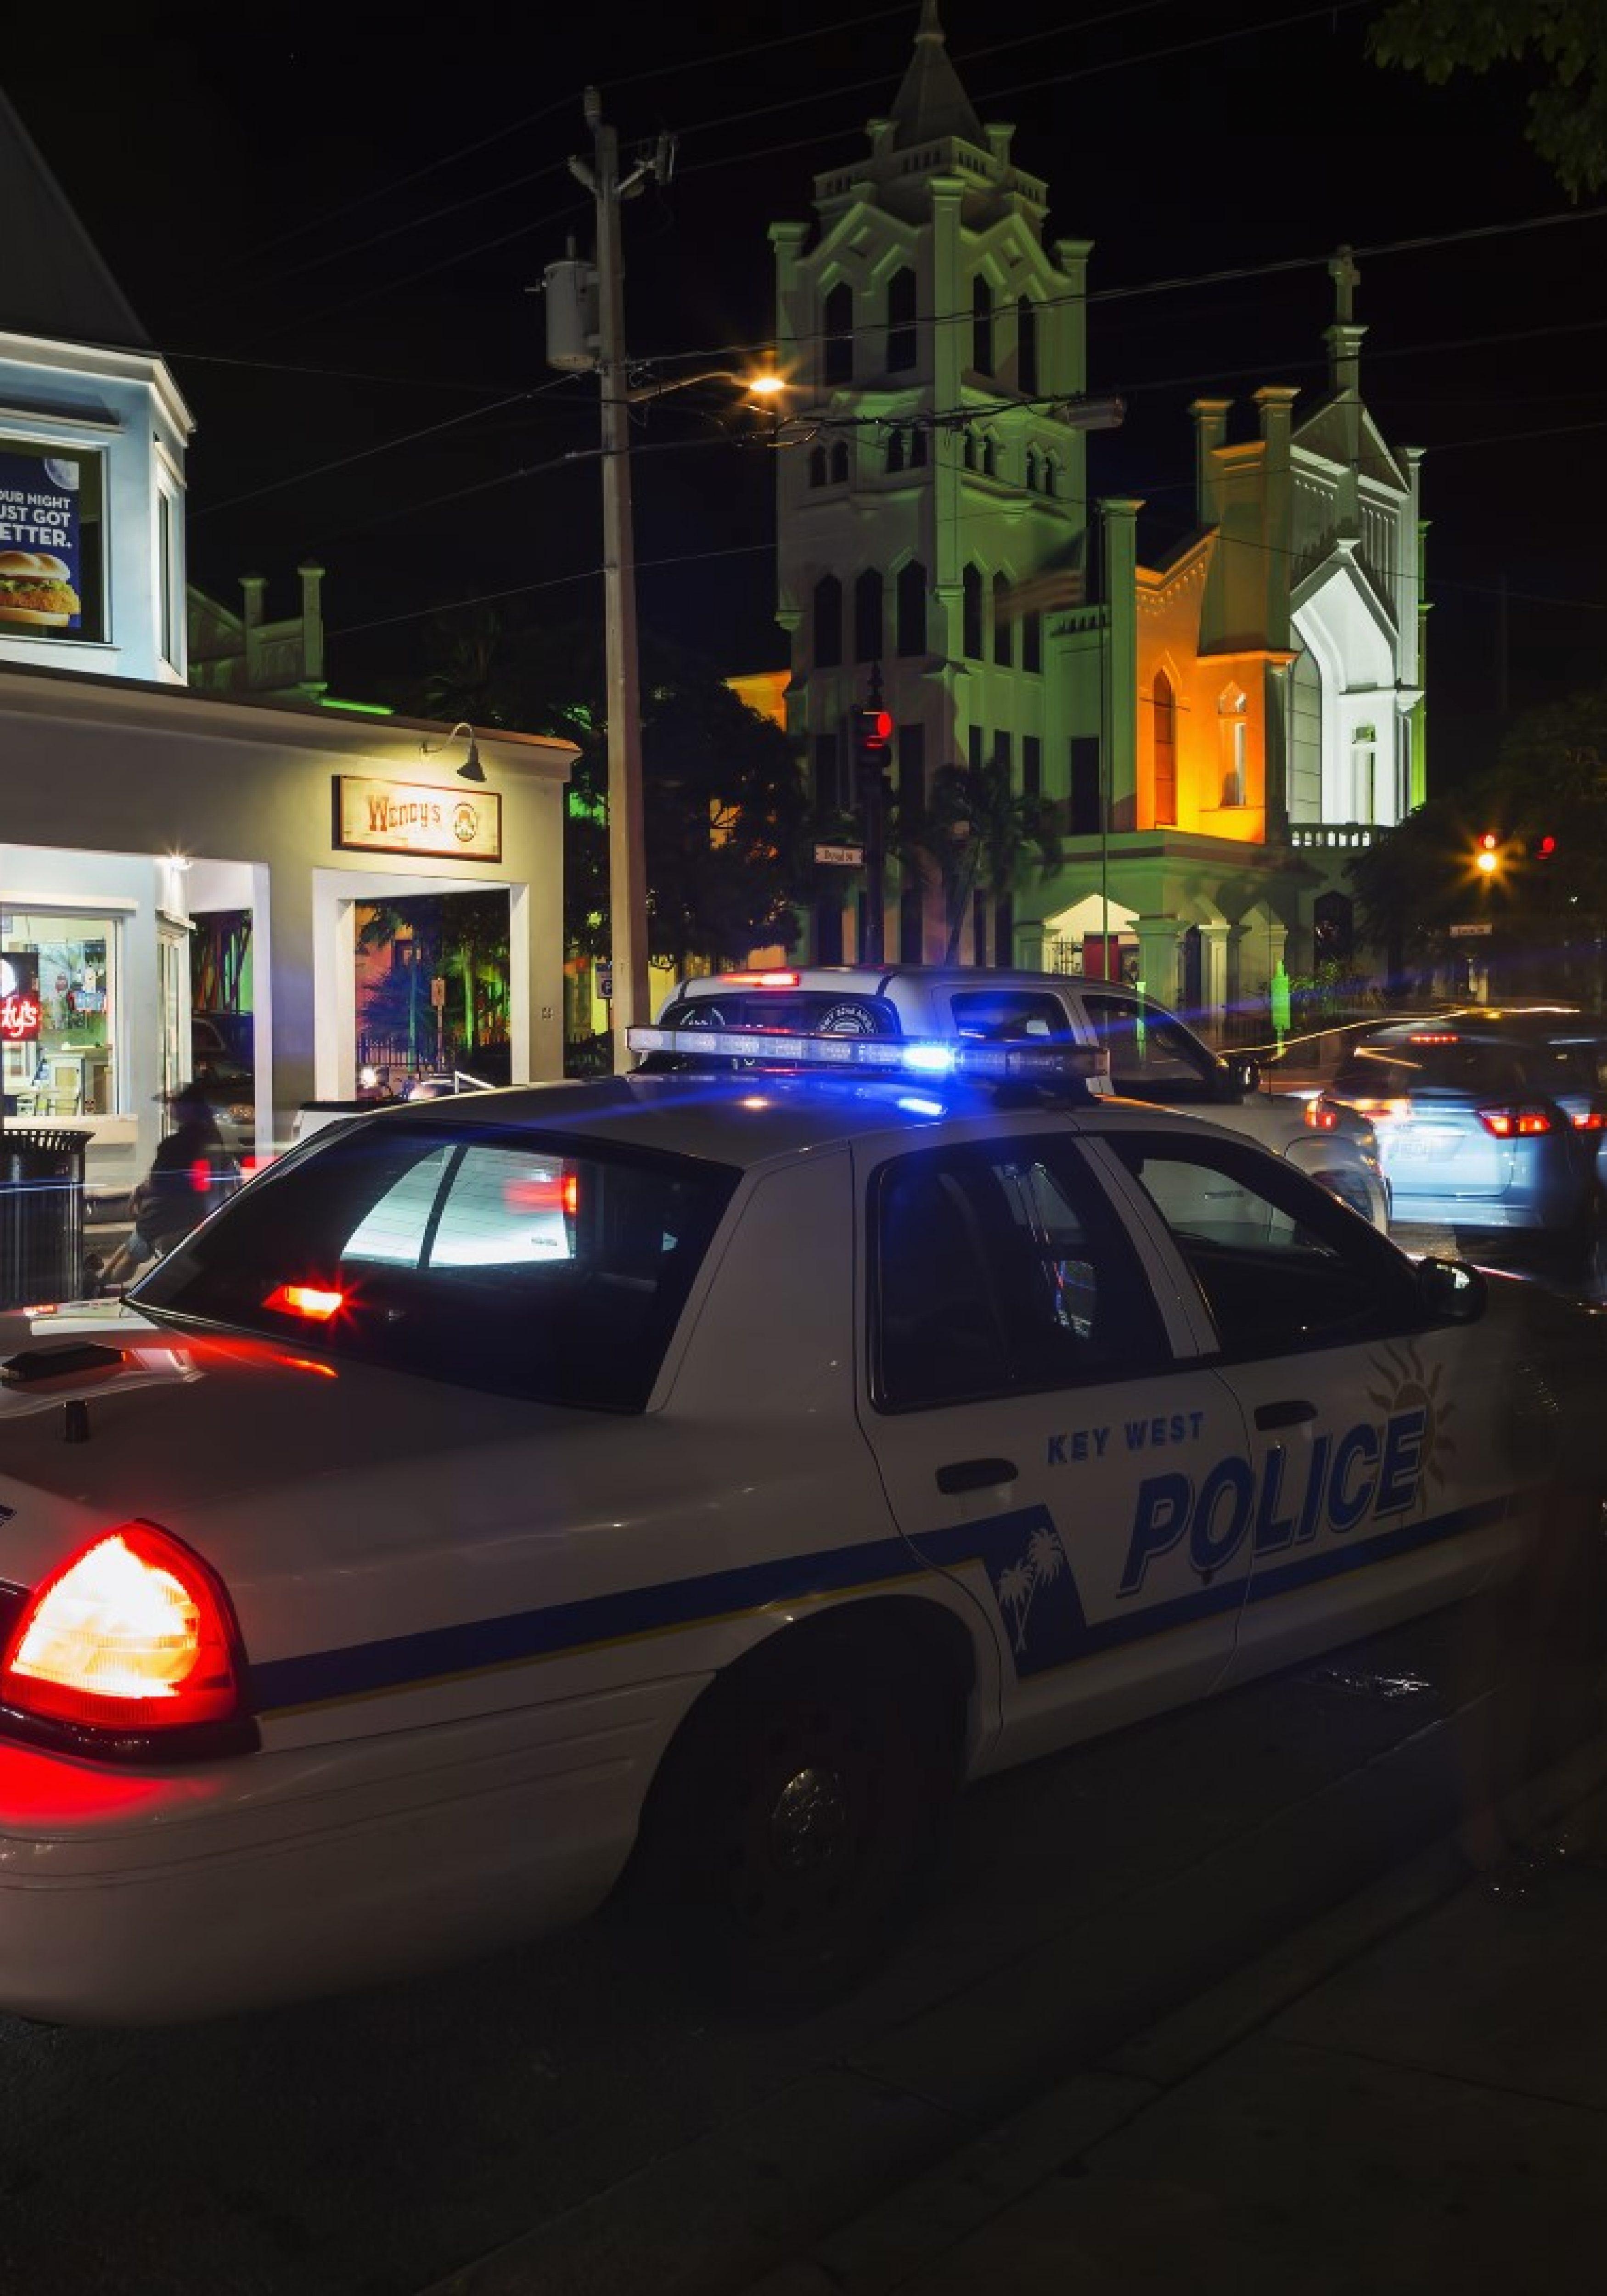 Florida-crime-rate-Large-3500x5000.jpg